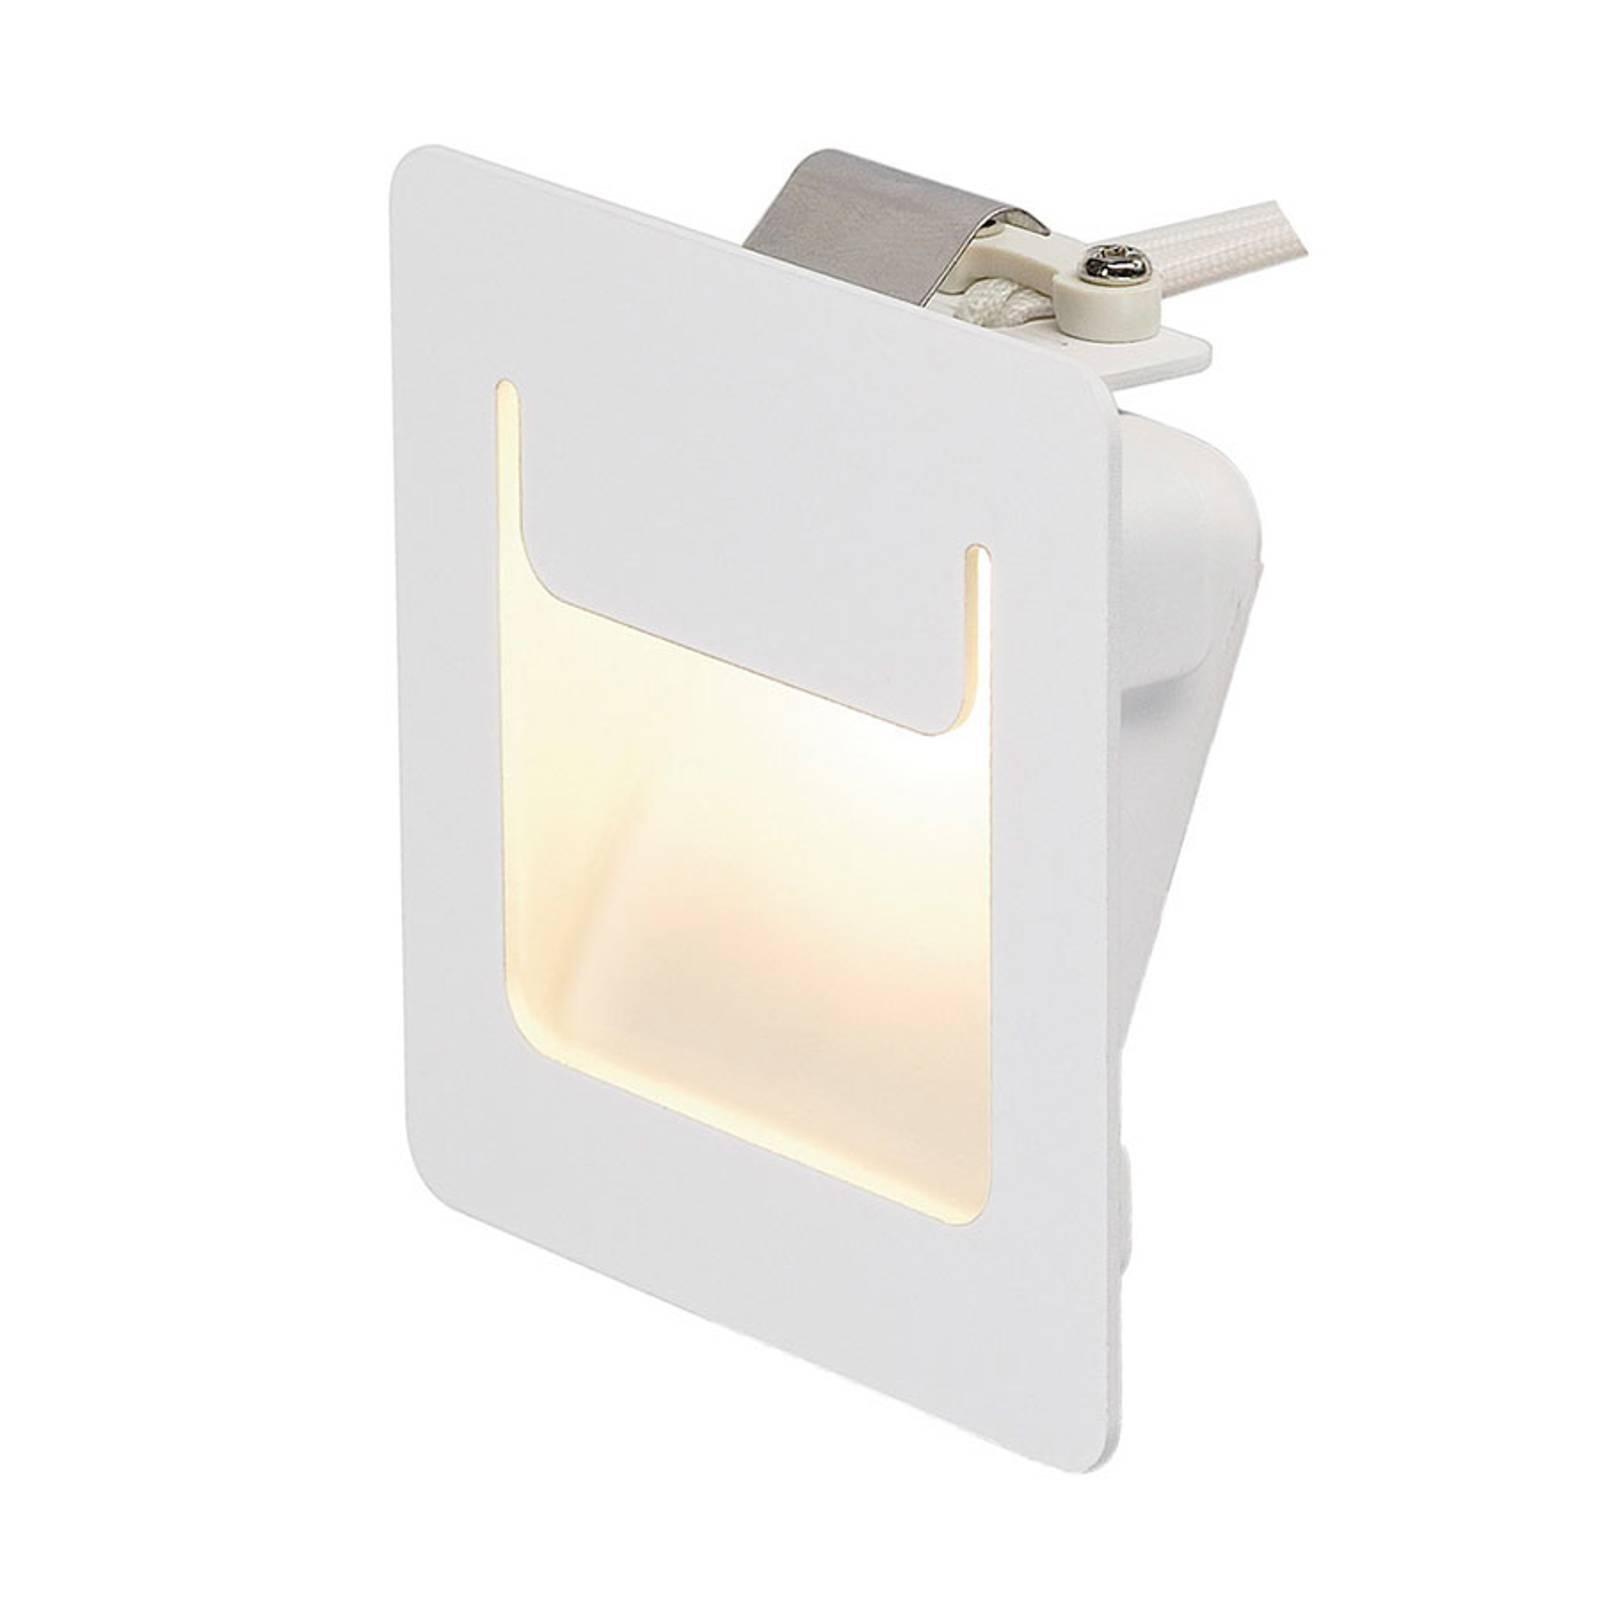 SLV downlight LED Downunder Pur 80 LED bianco